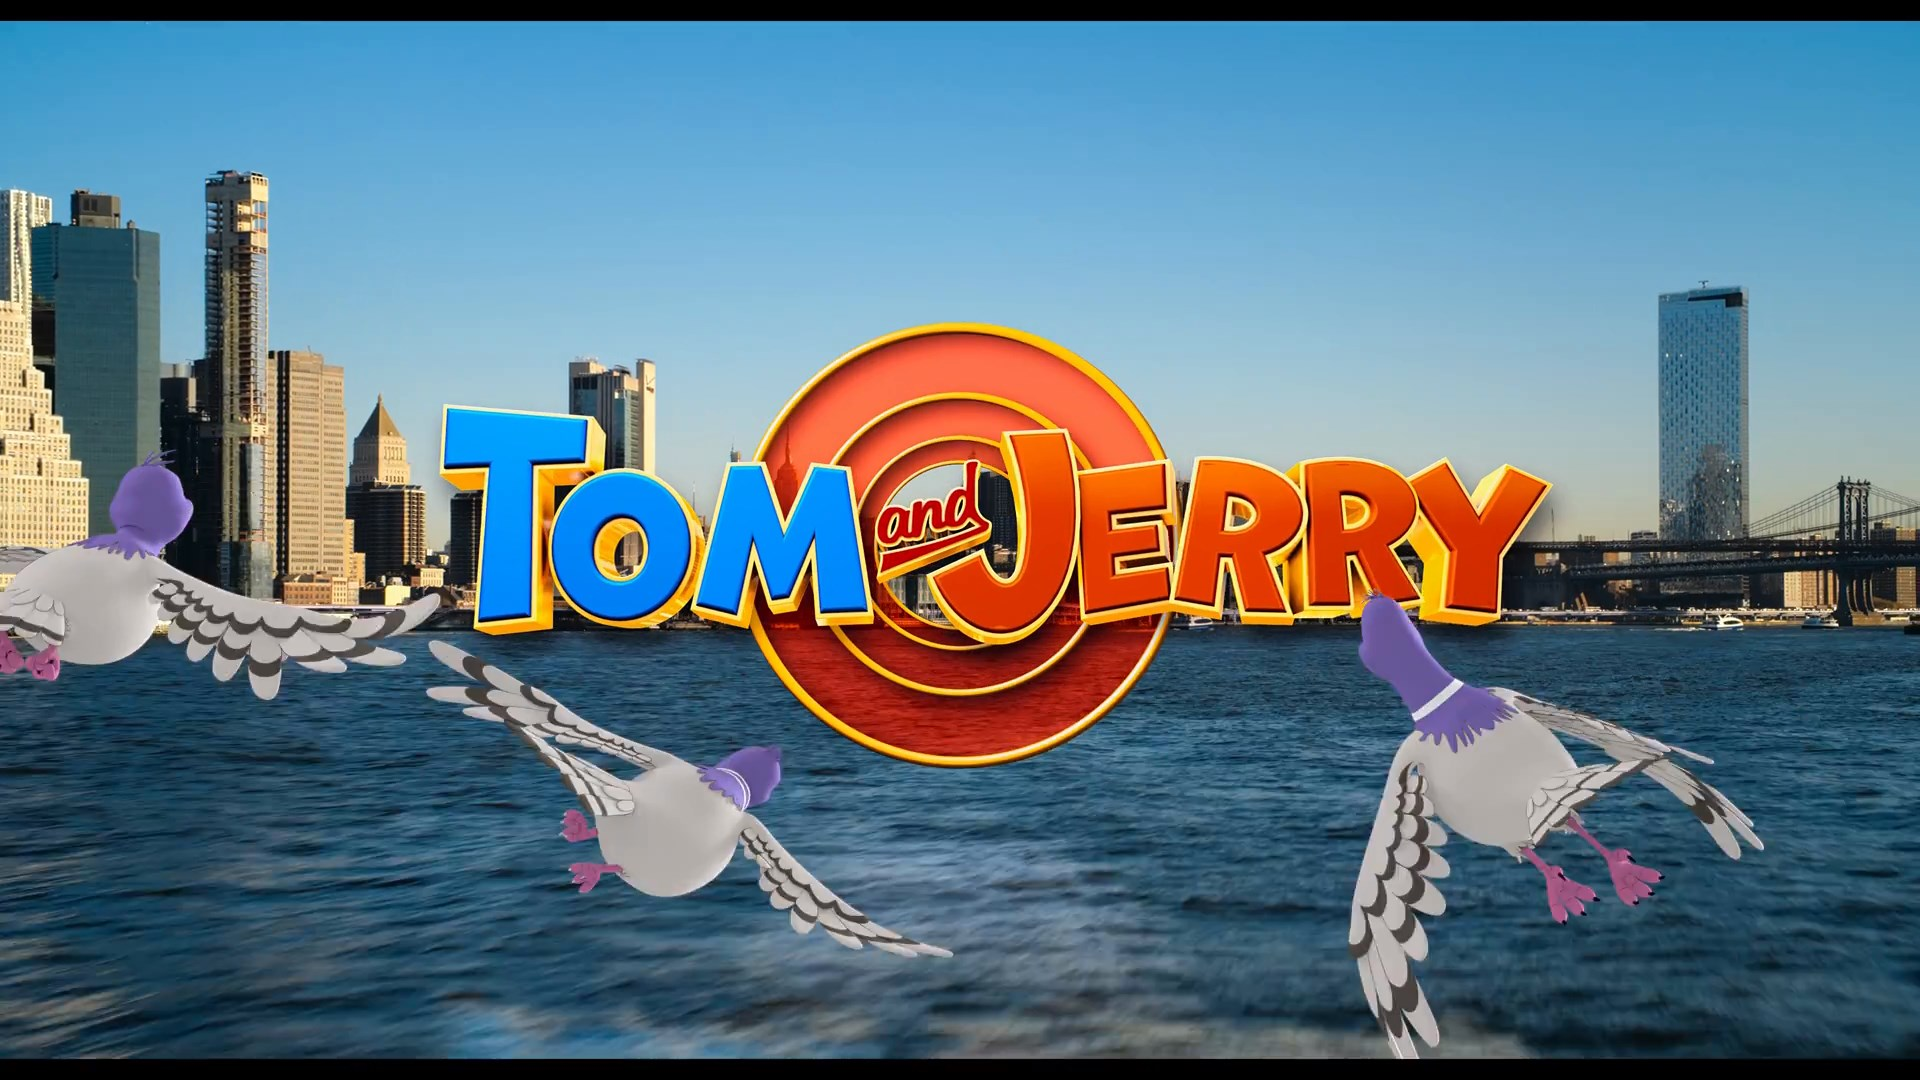 Tom y Jerry (2021) 1080p WEB-DL Latino